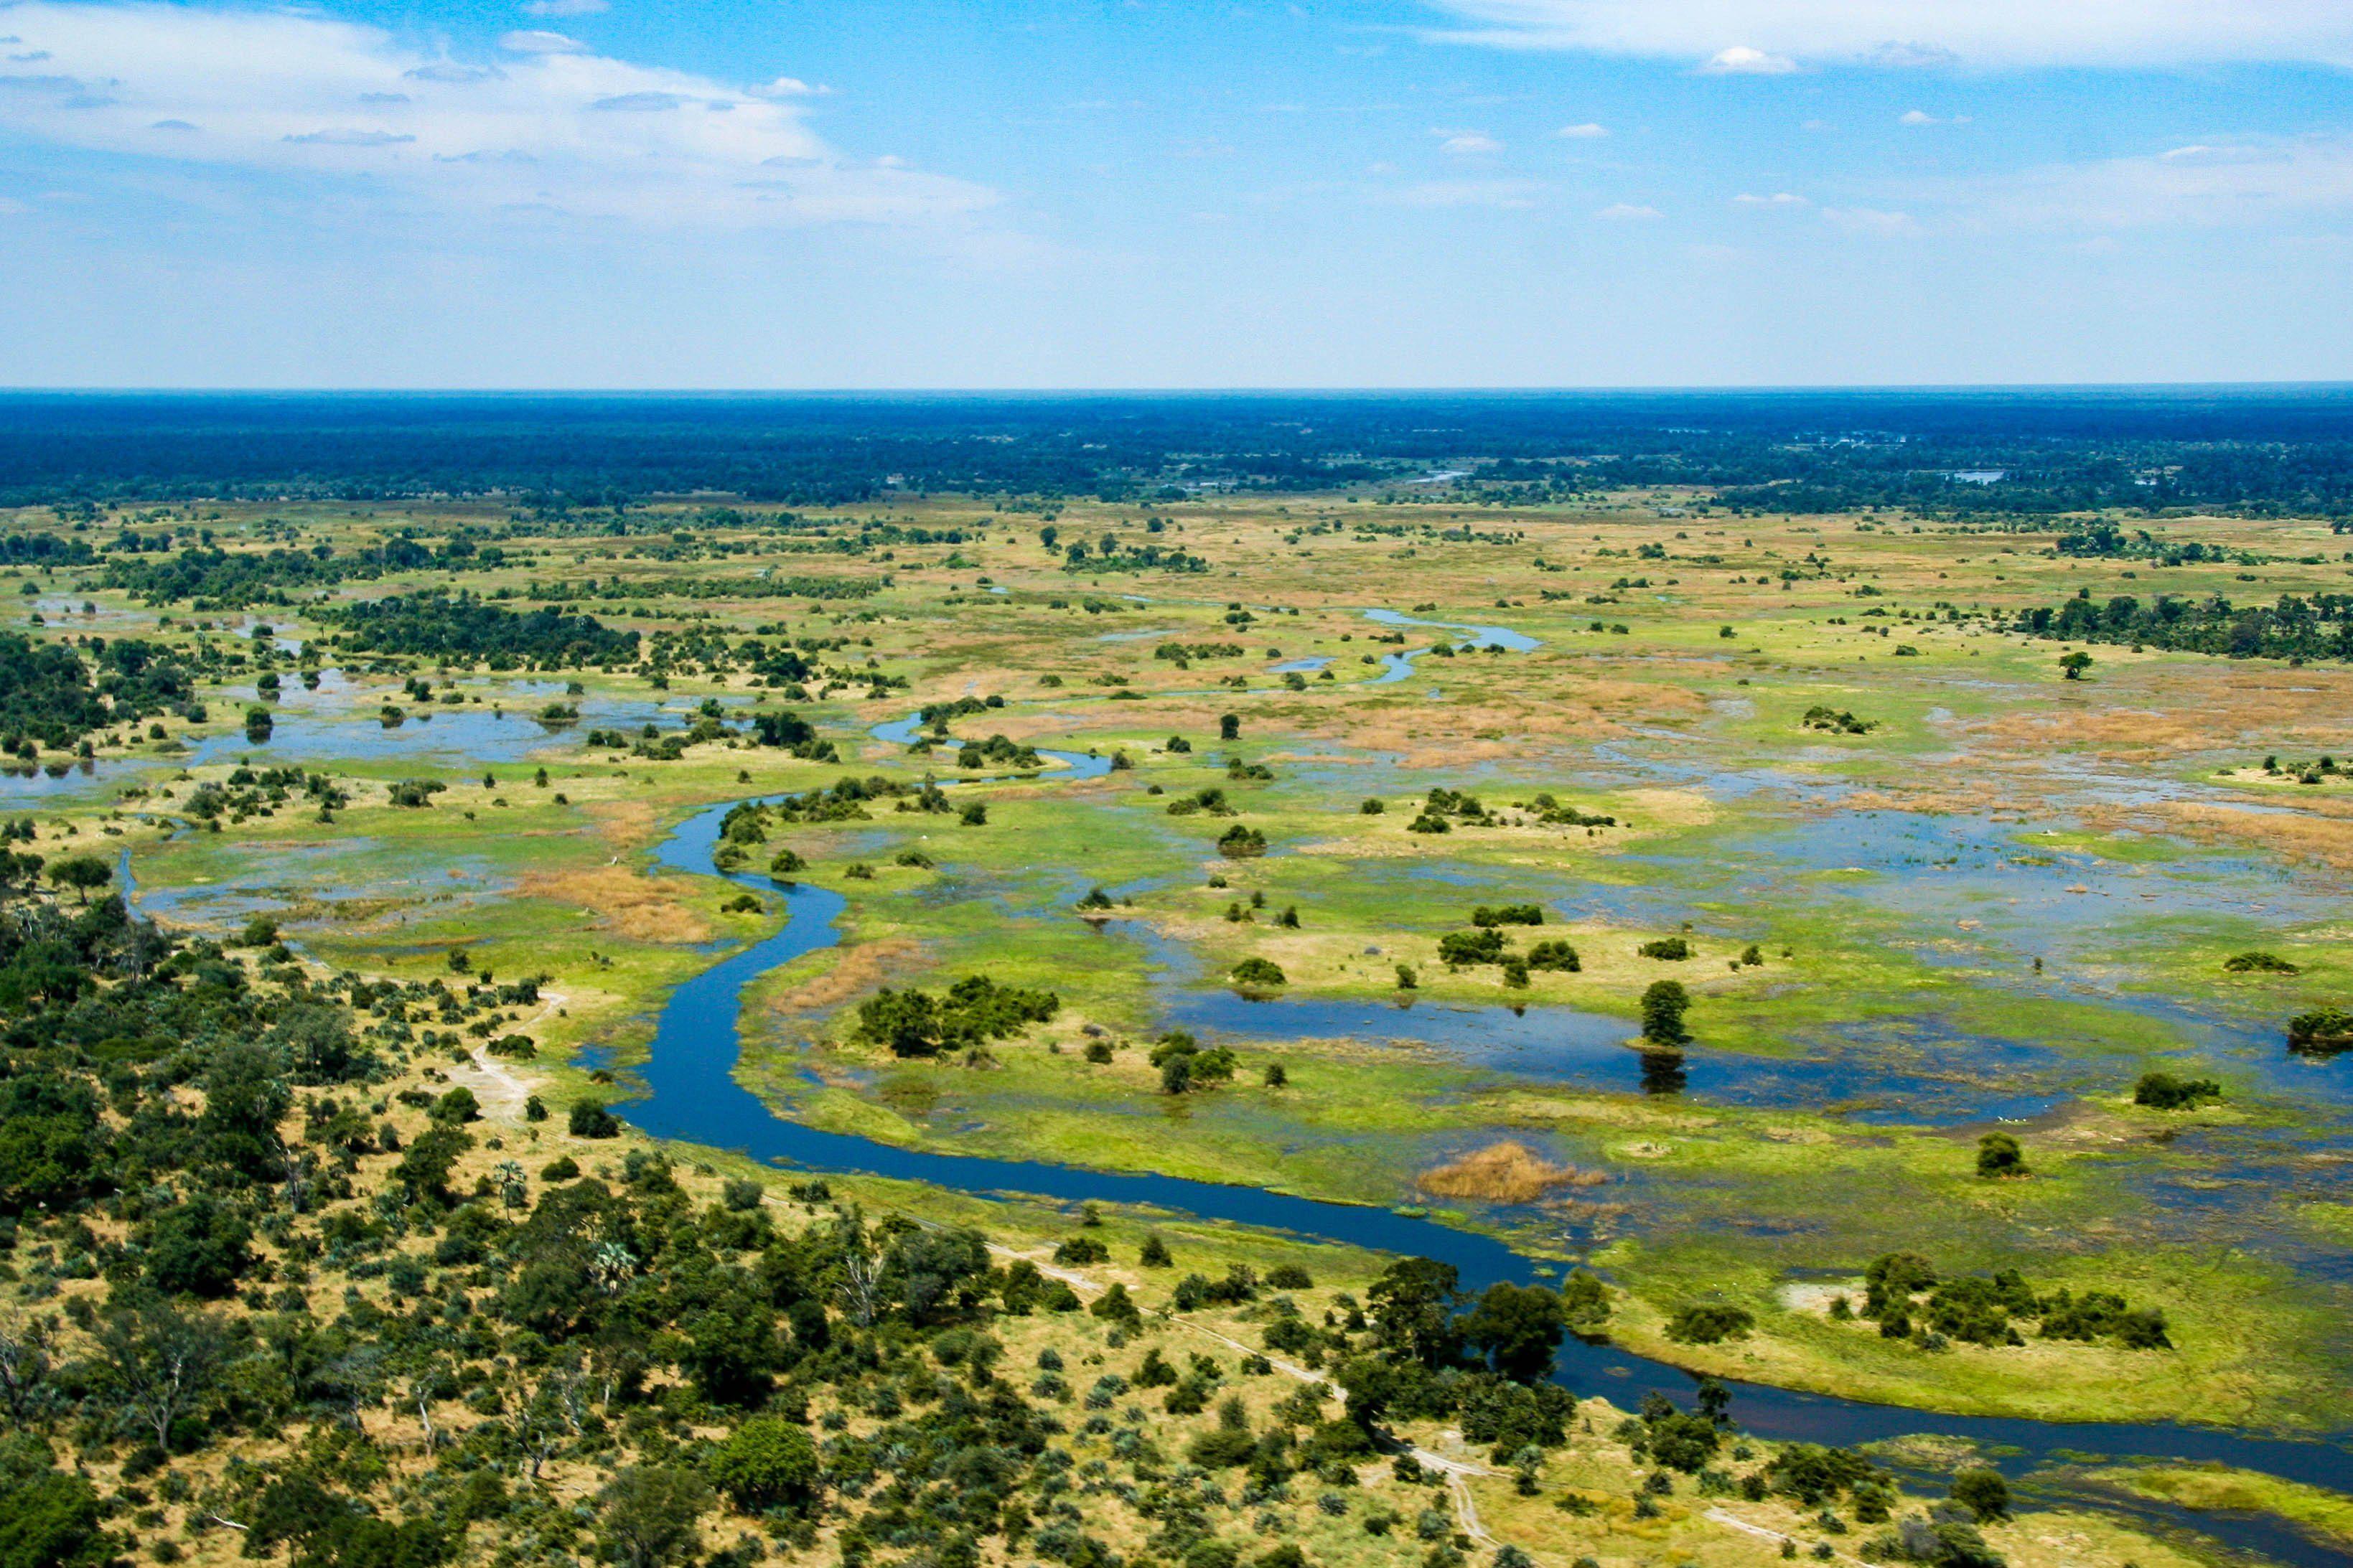 The Okavango Delta, Botswana